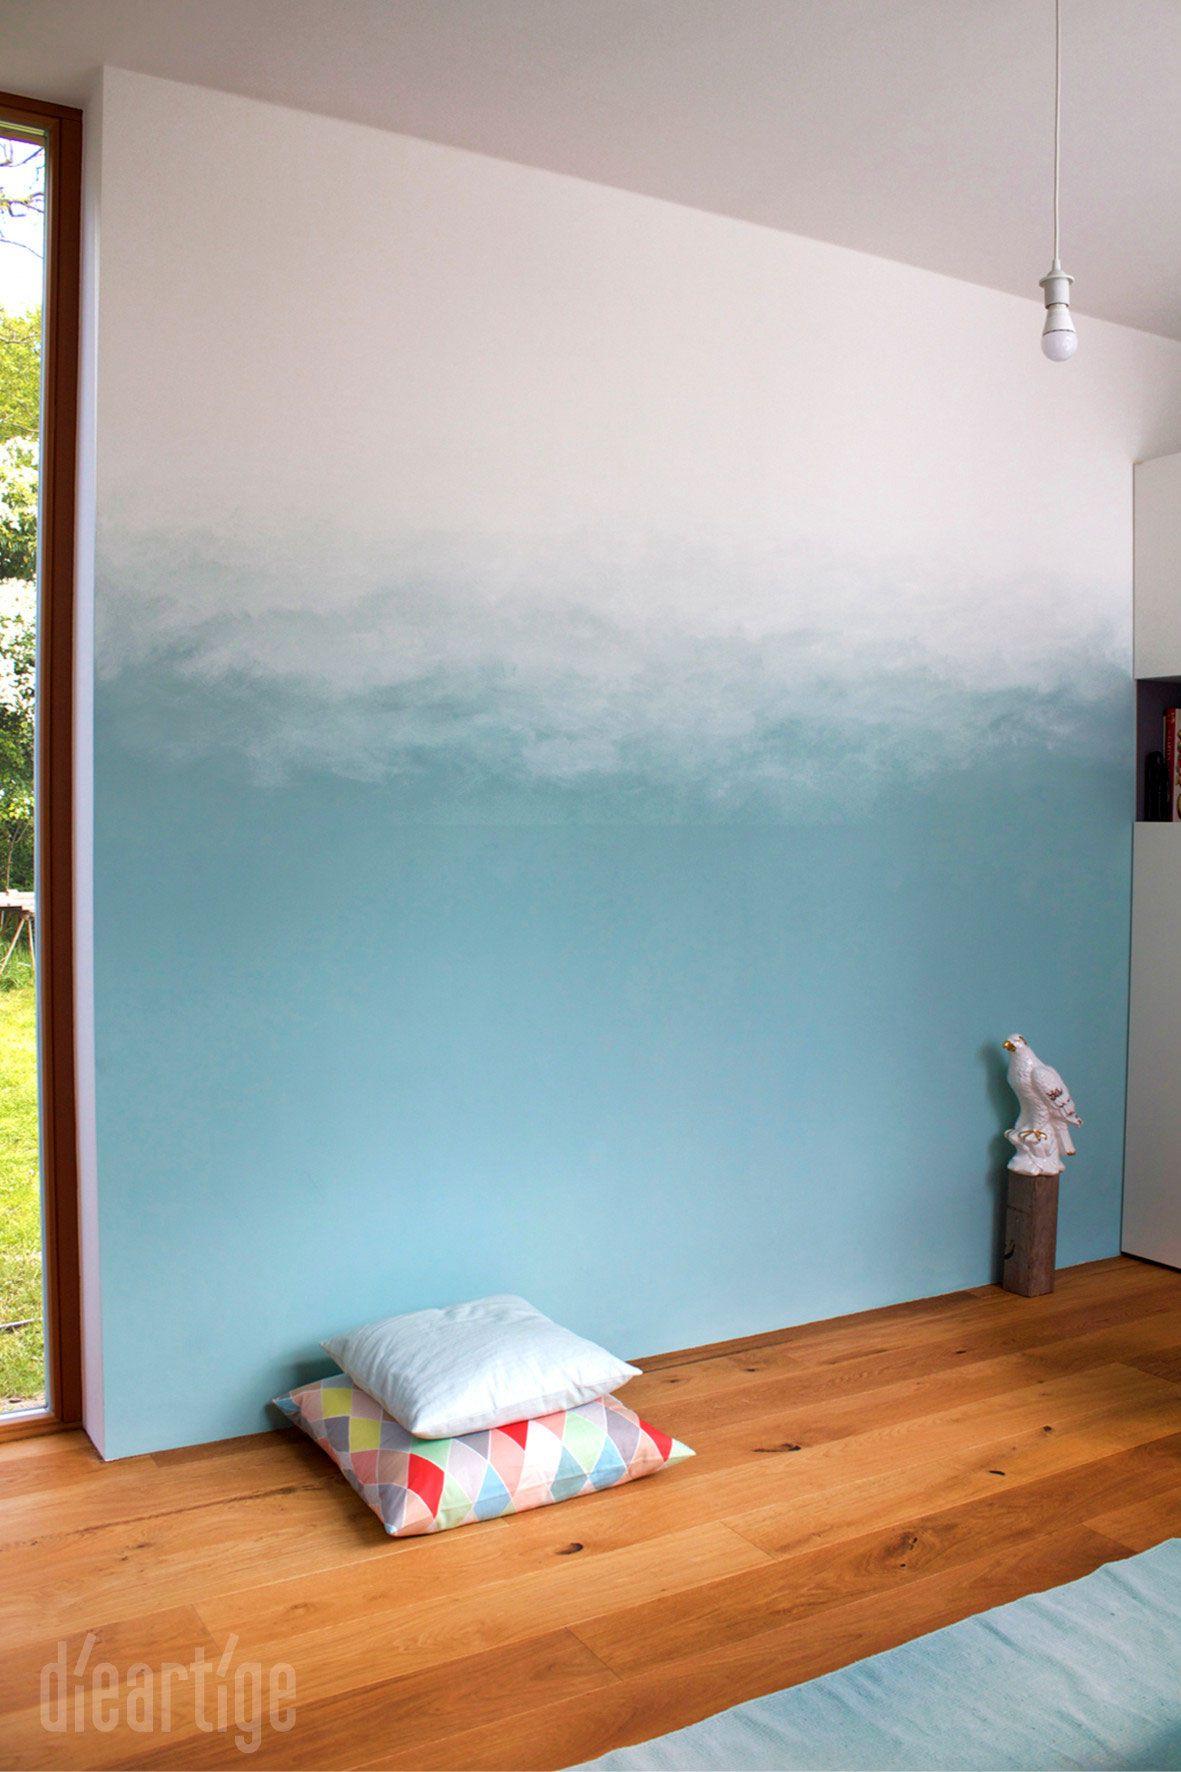 Meer An Der Wand Wandgestaltung Farbgestaltung Babyzimmer